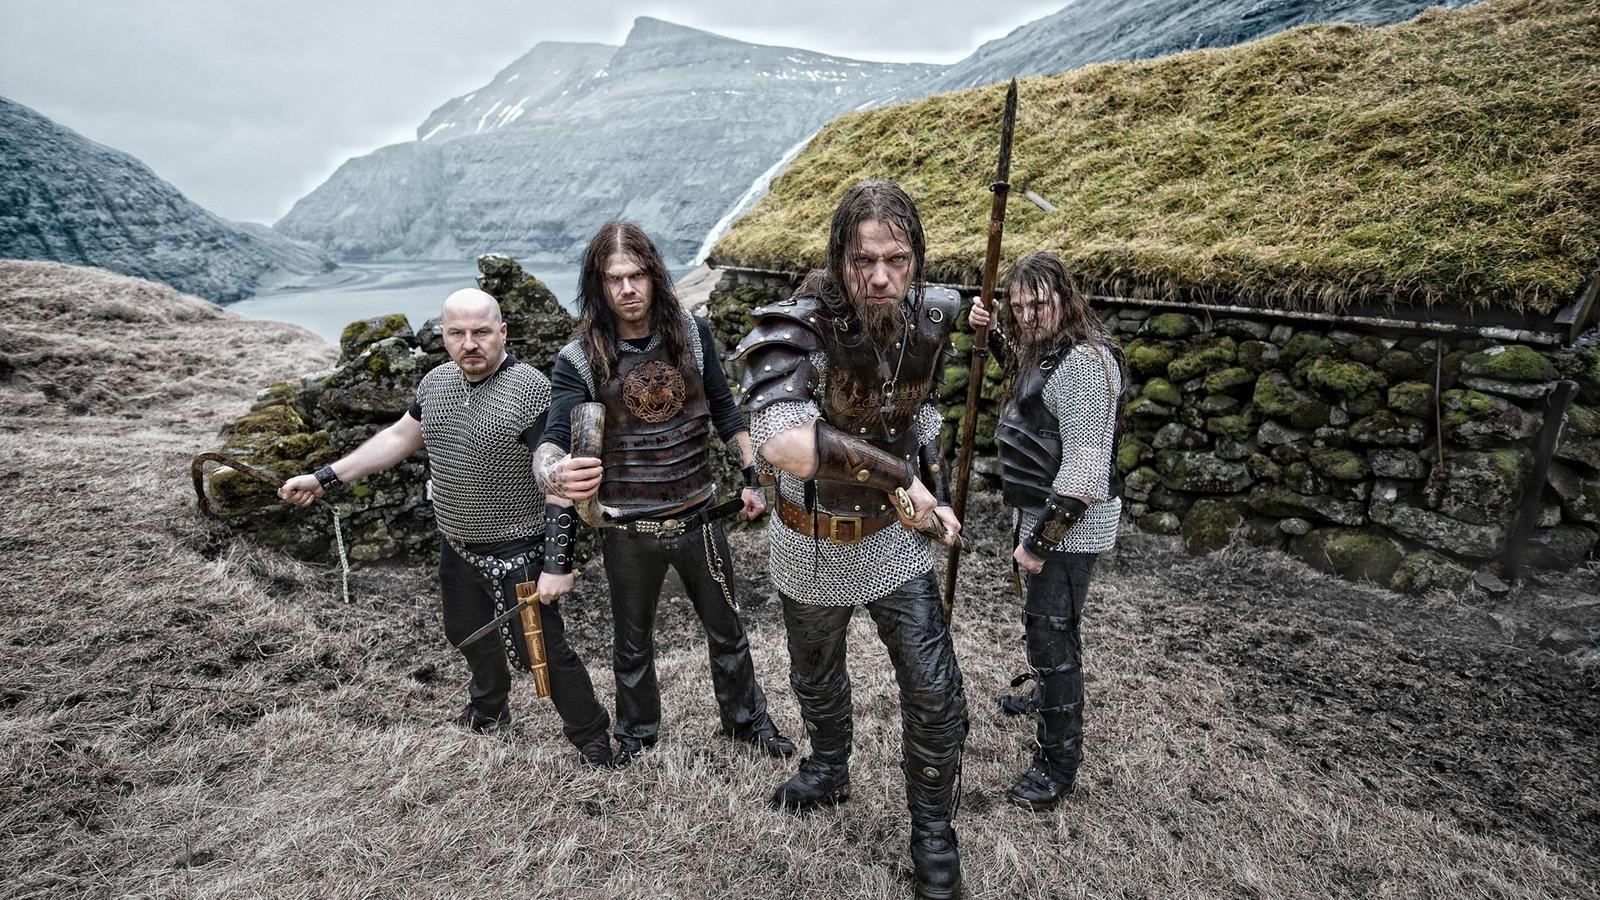 Download wallpaper 1600x900 tyr warriors band mountains bald 1600x900